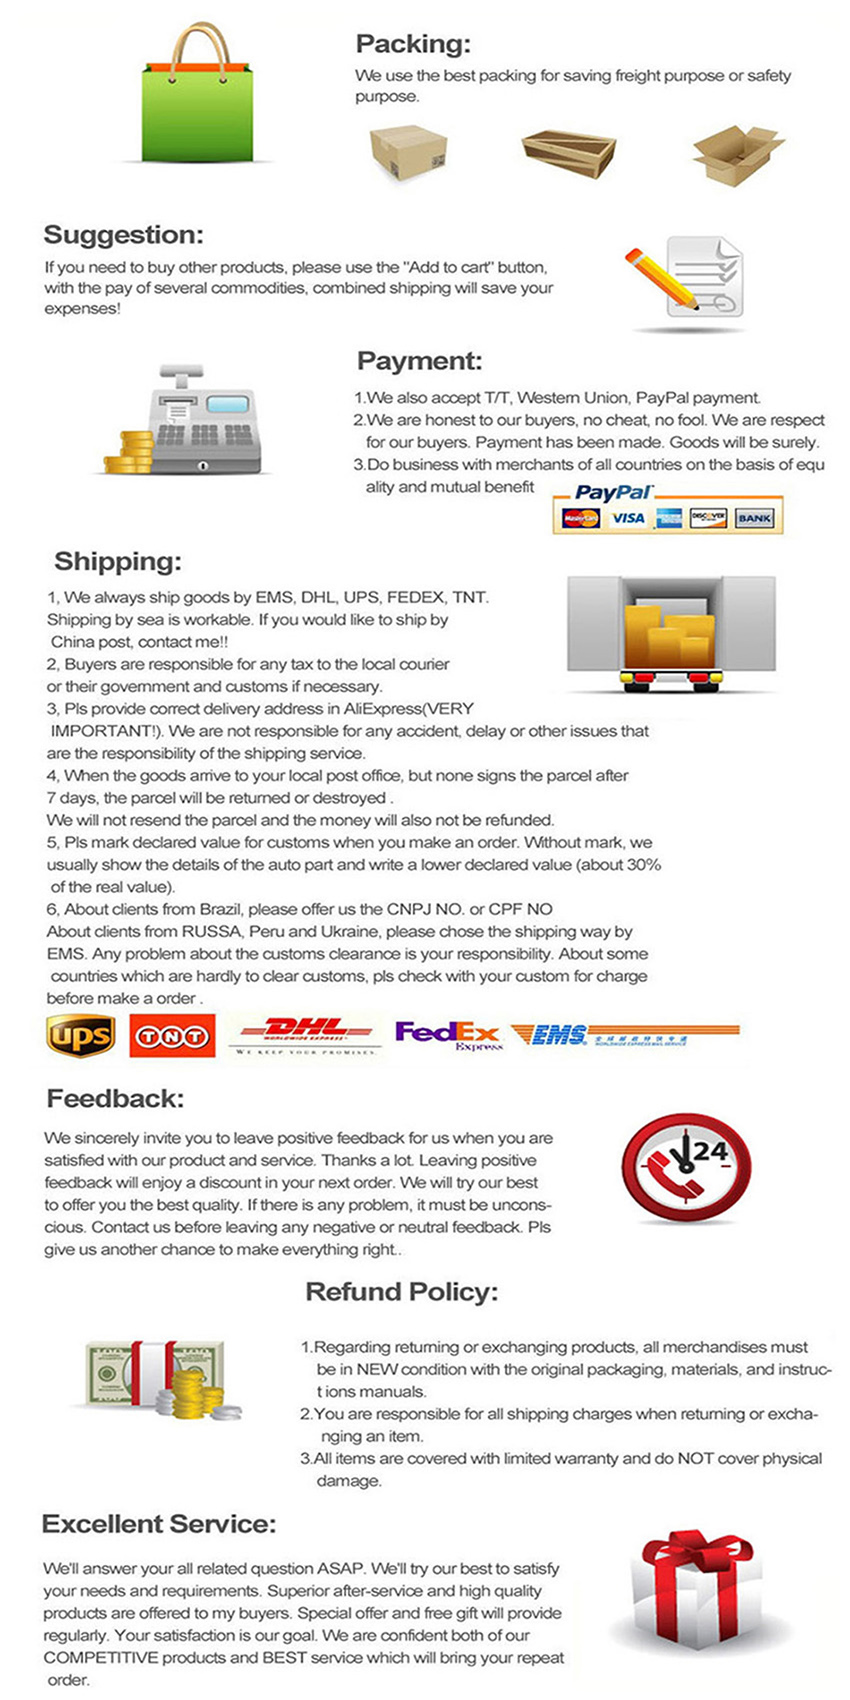 Lf12002 150cm g12 g12 mangueiras de chuveiro de pvc de alta packing page fandeluxe Images